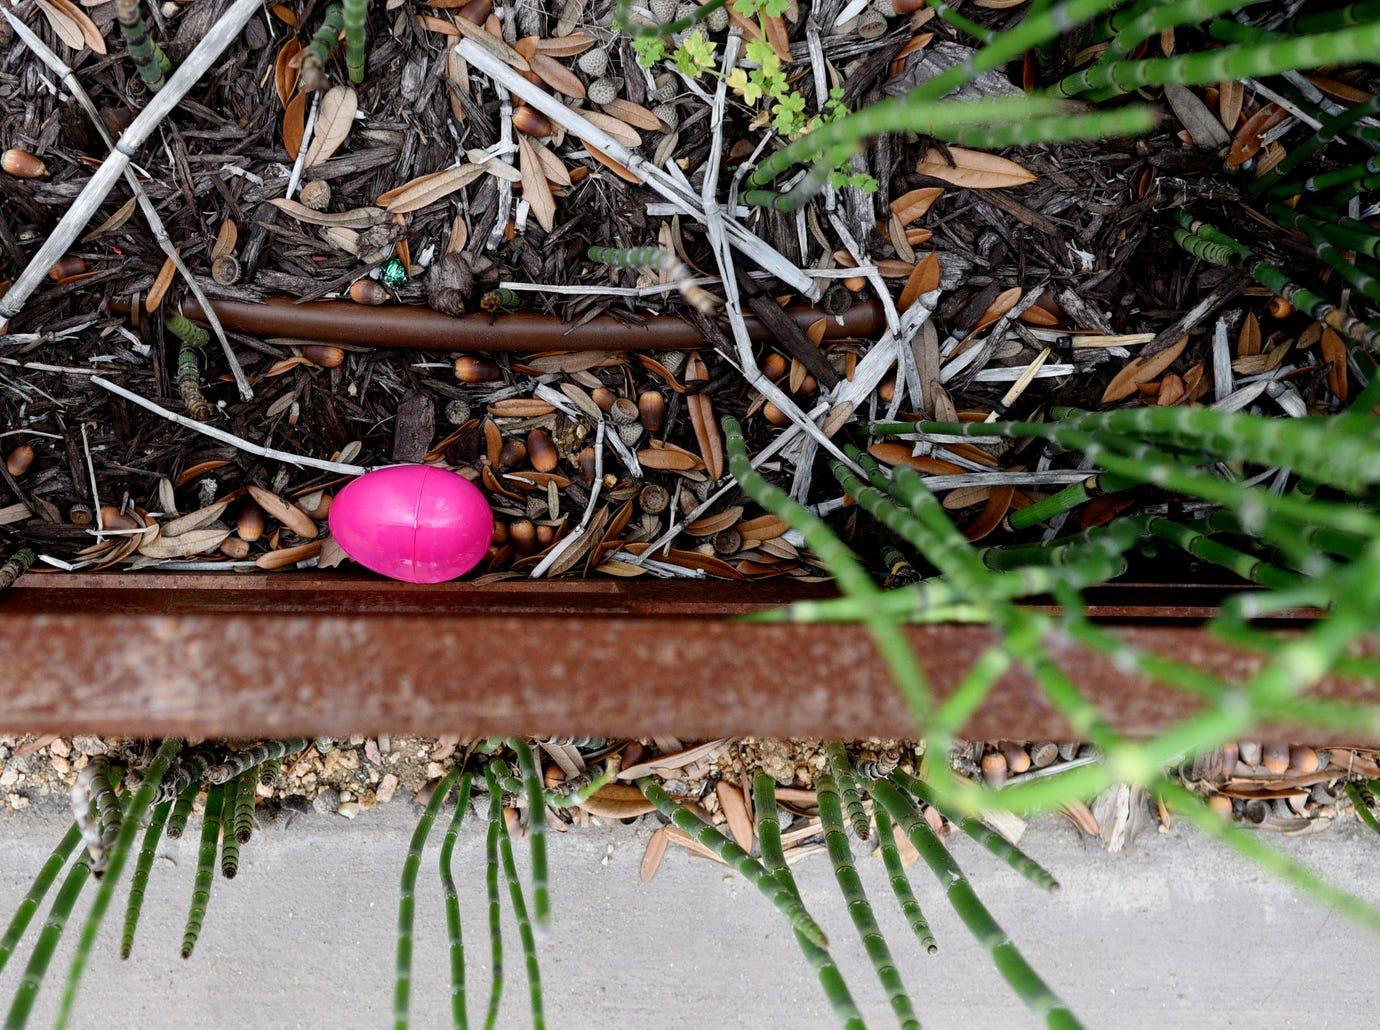 Adult Easter Egg Hunt in the East Bank District Thursday evening April 11, 2019.